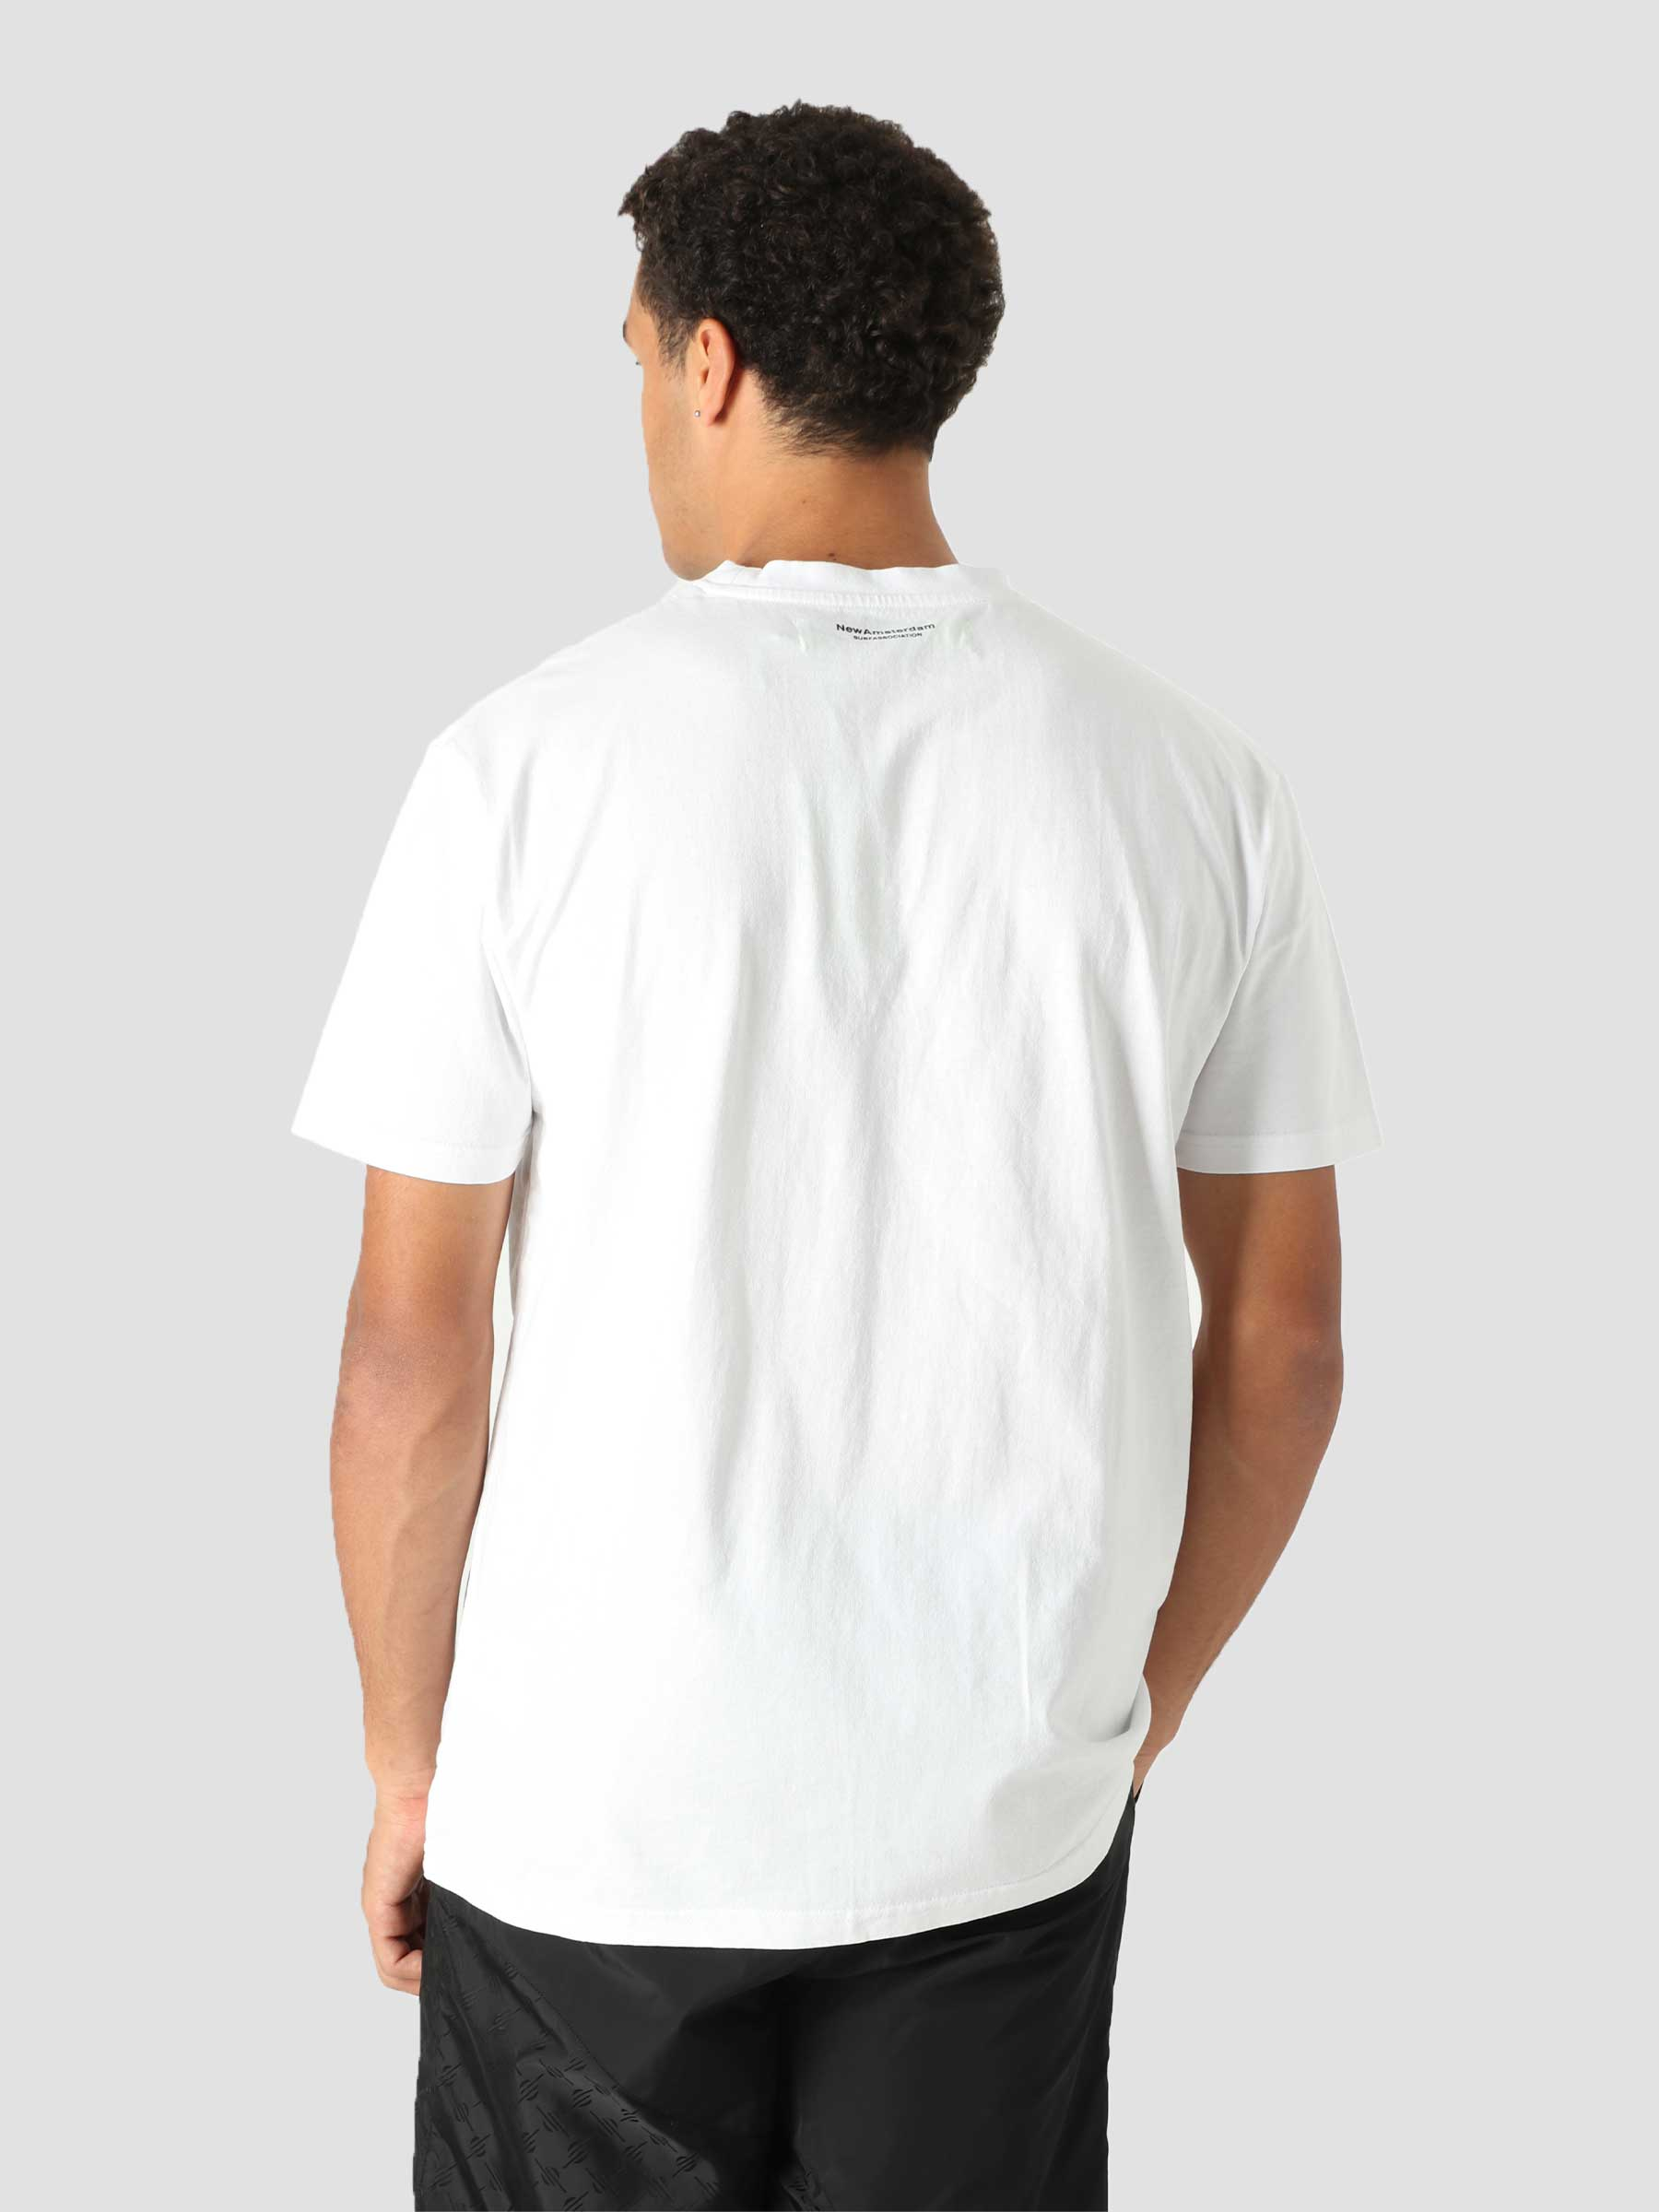 Dice T-Shirt White  2021200